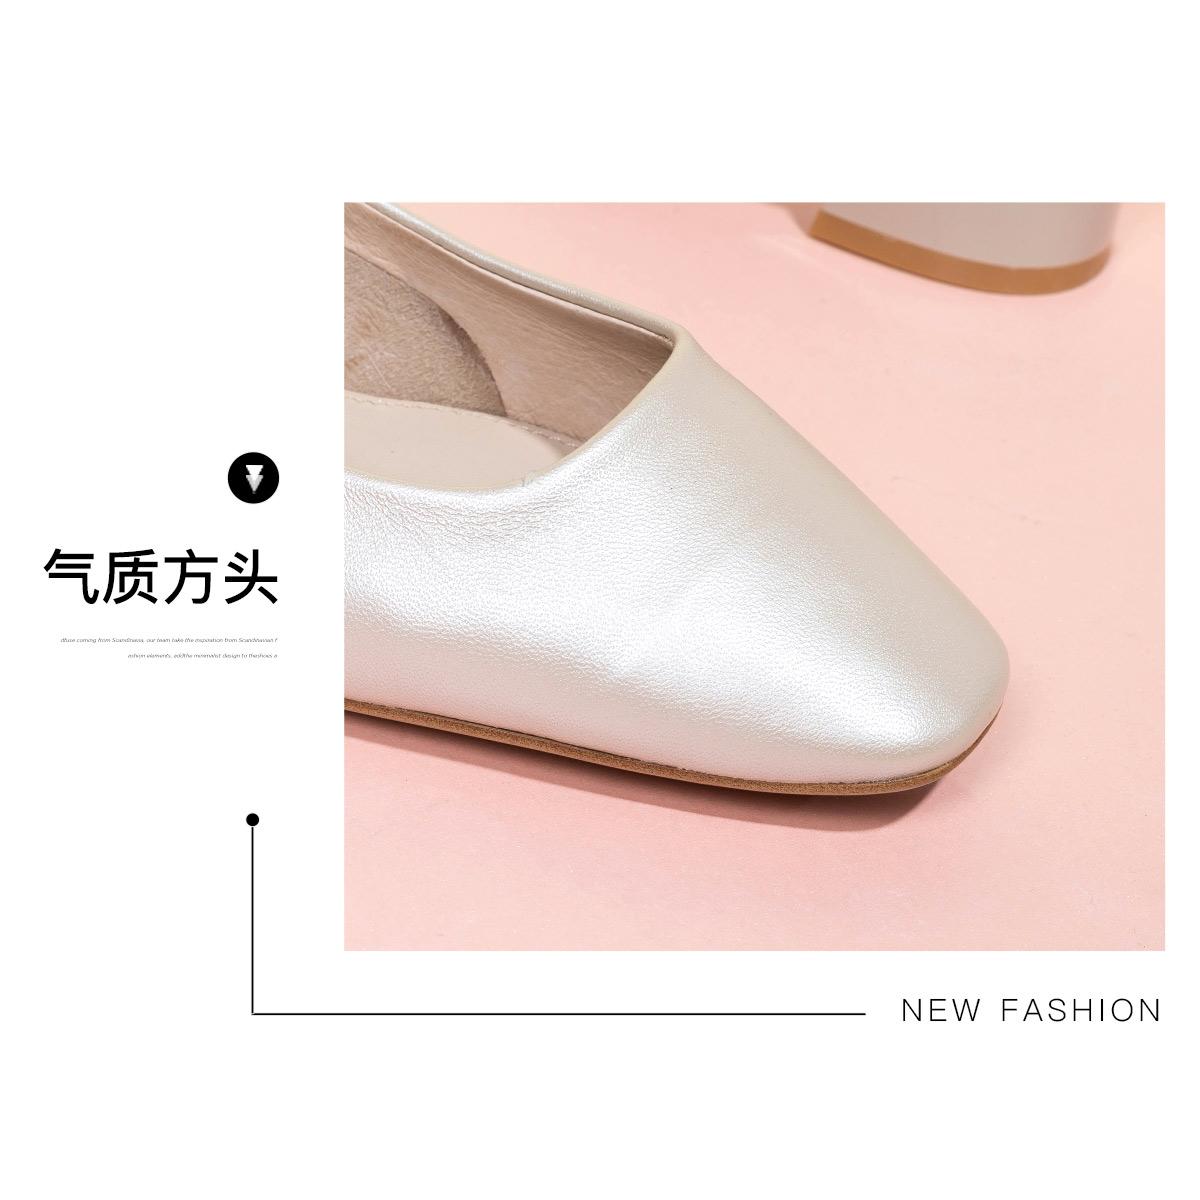 SS03111092 星期六春秋新款马蹄跟浅口单鞋时尚方头纯色通勤女鞋子